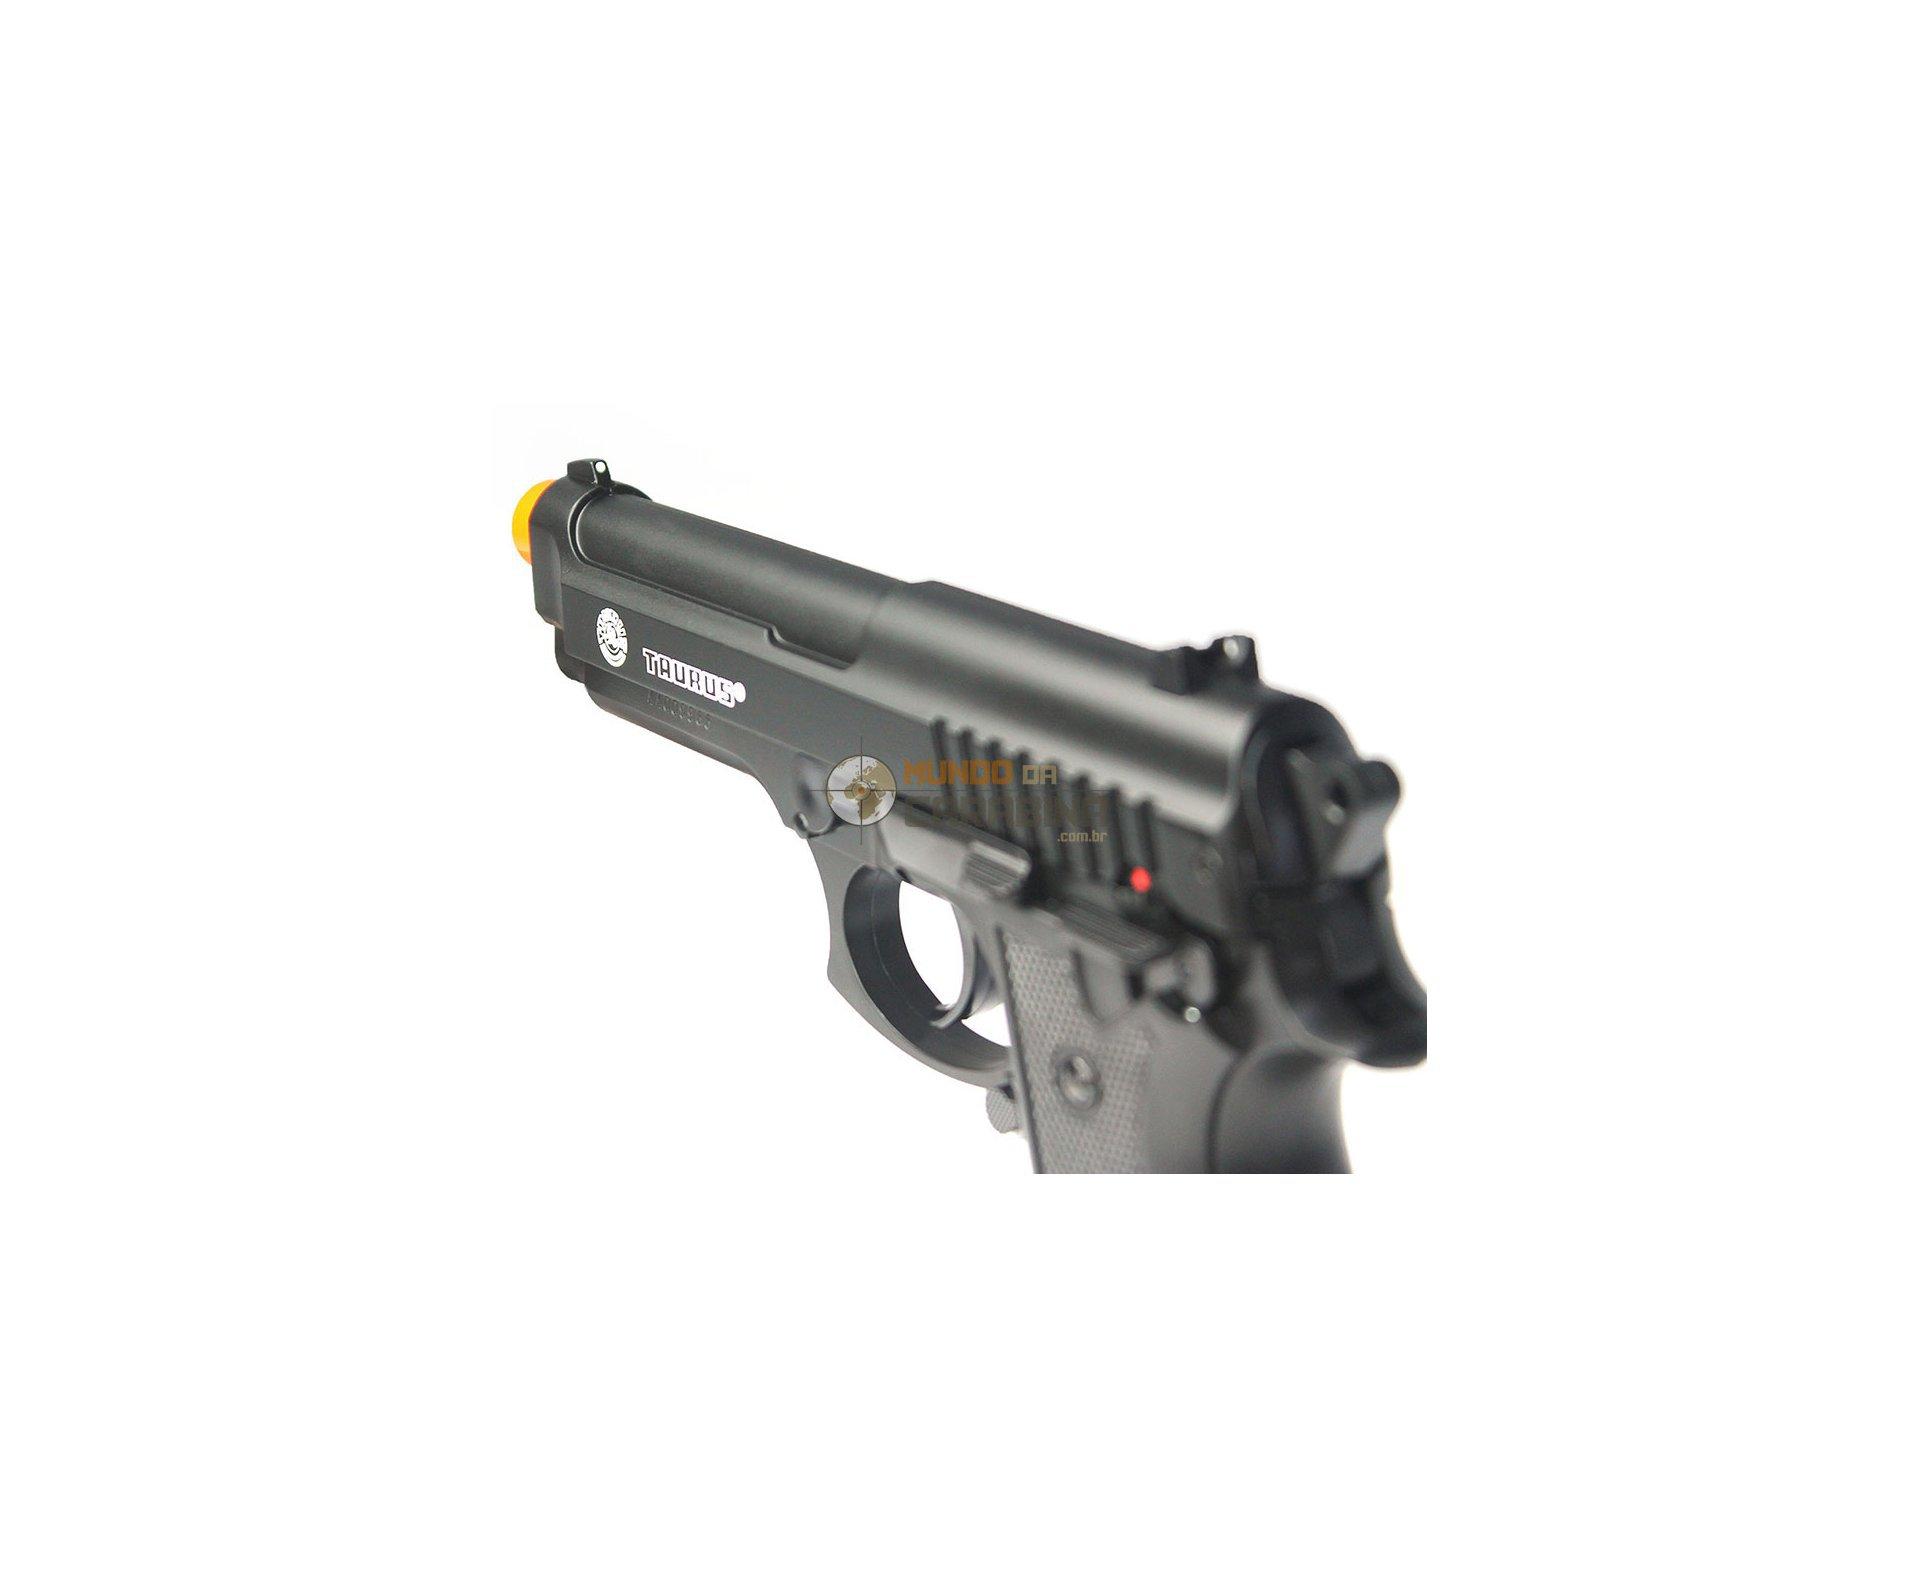 Pistola De Airsoft Taurus Pt 92 Slide Metal + 4000 Esferas 0,12g + Capa Almofada - Cyber Gun